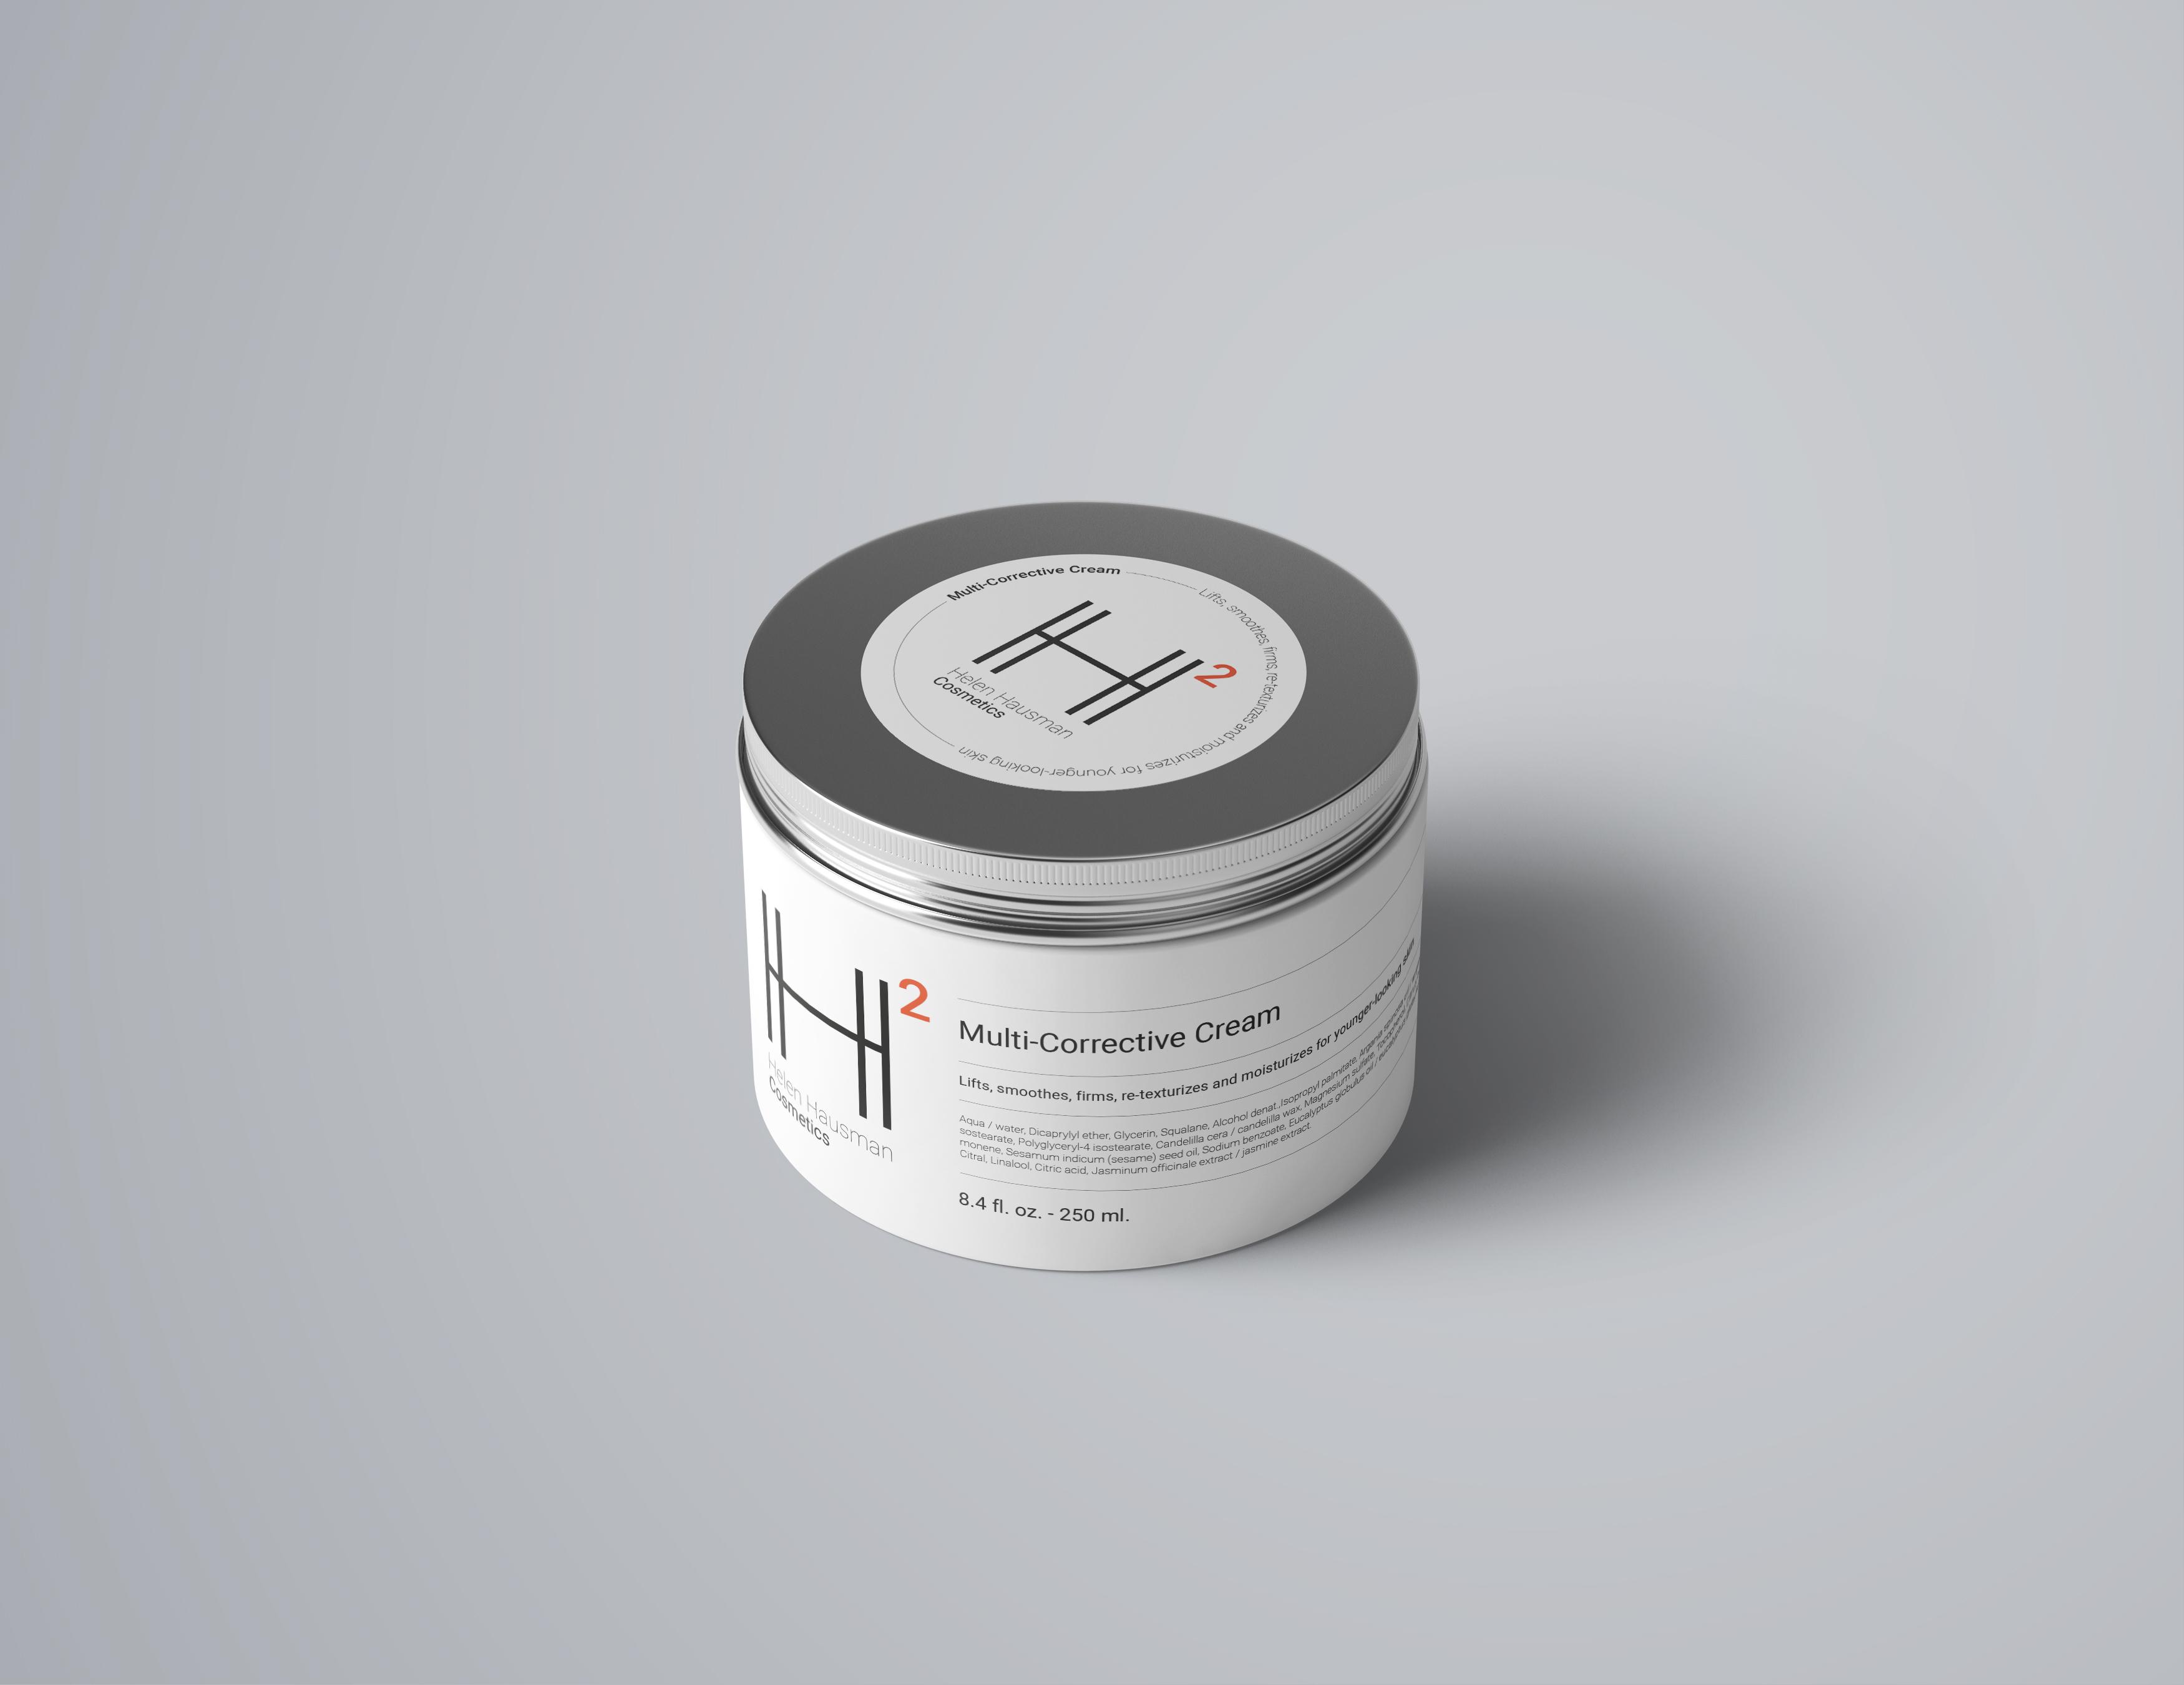 Helenhausman Cosmetics Branding Packaging On Behance Citra Hand Body Lotion Youthful White 250 Ml